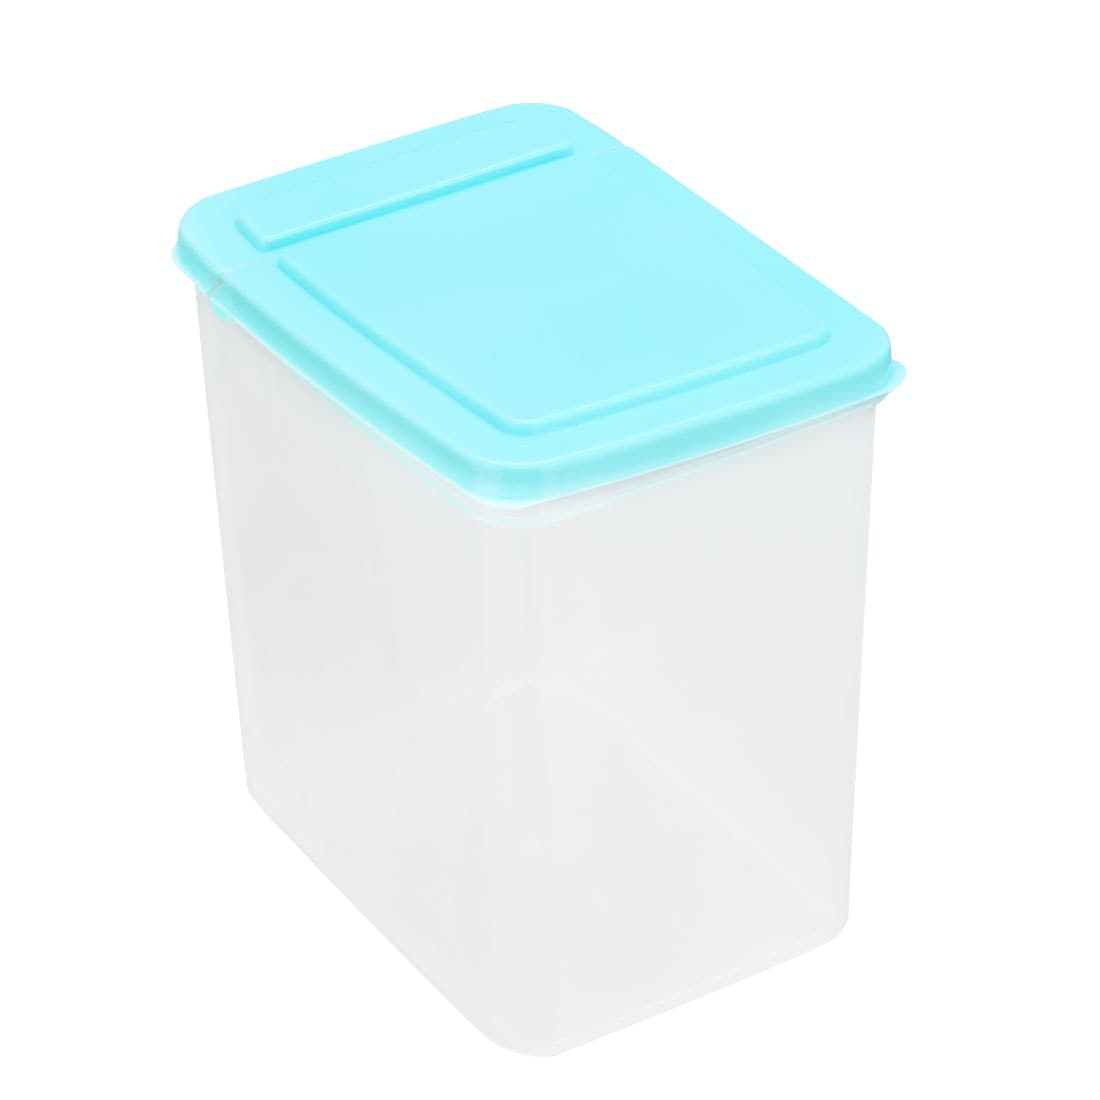 Shop Food Storage Container W Lid Kitchen Plastic Snack Food Fresh